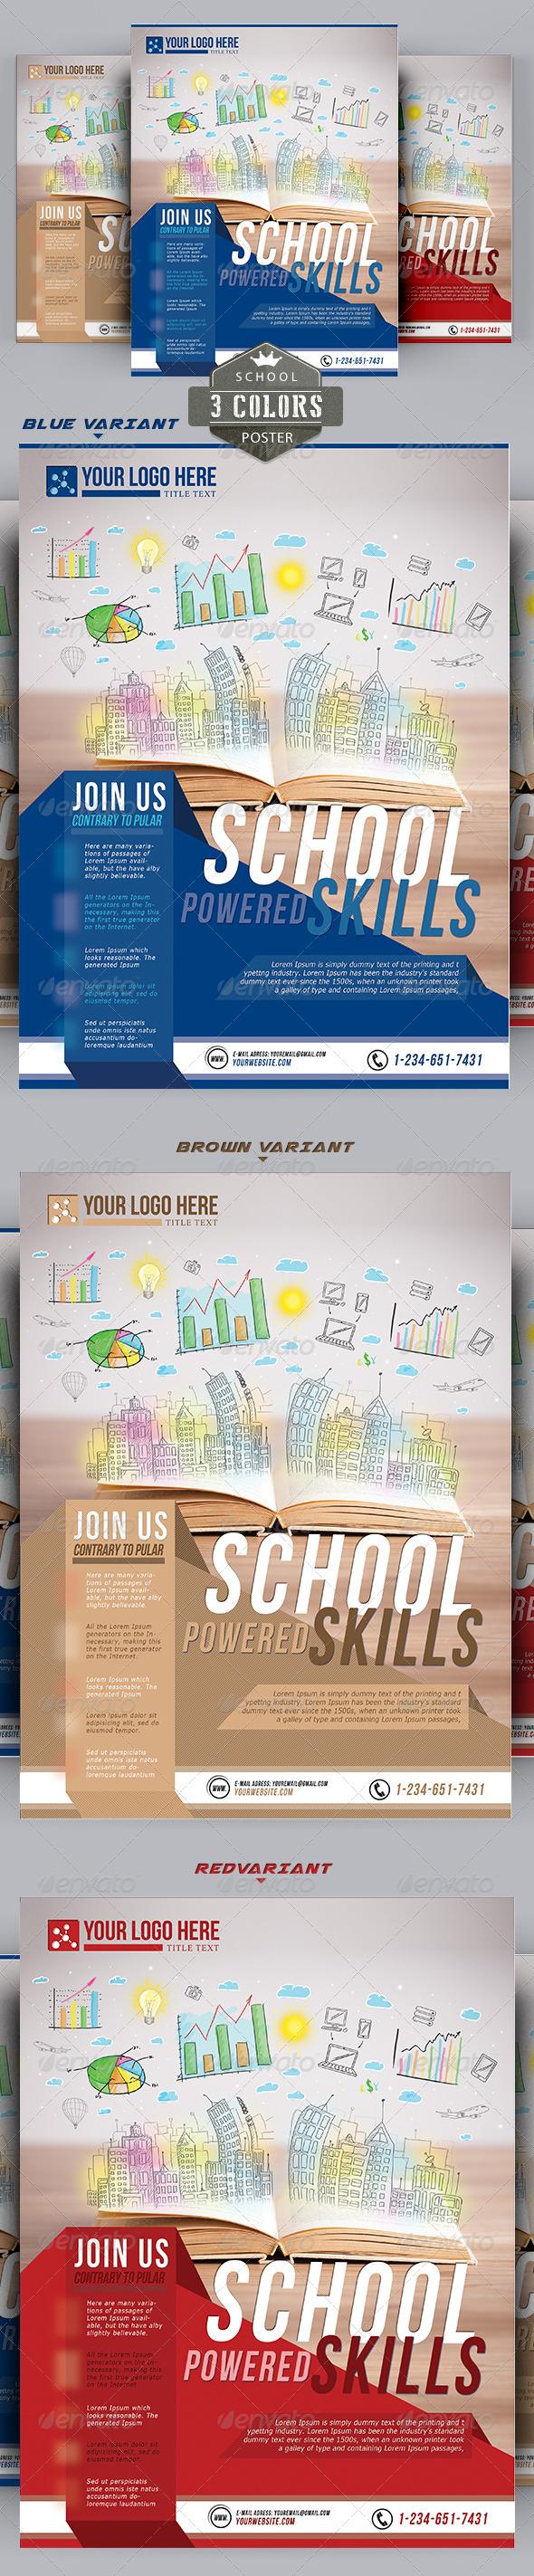 Fresh Skills Brochure 3 Colors - Corporate Brochures